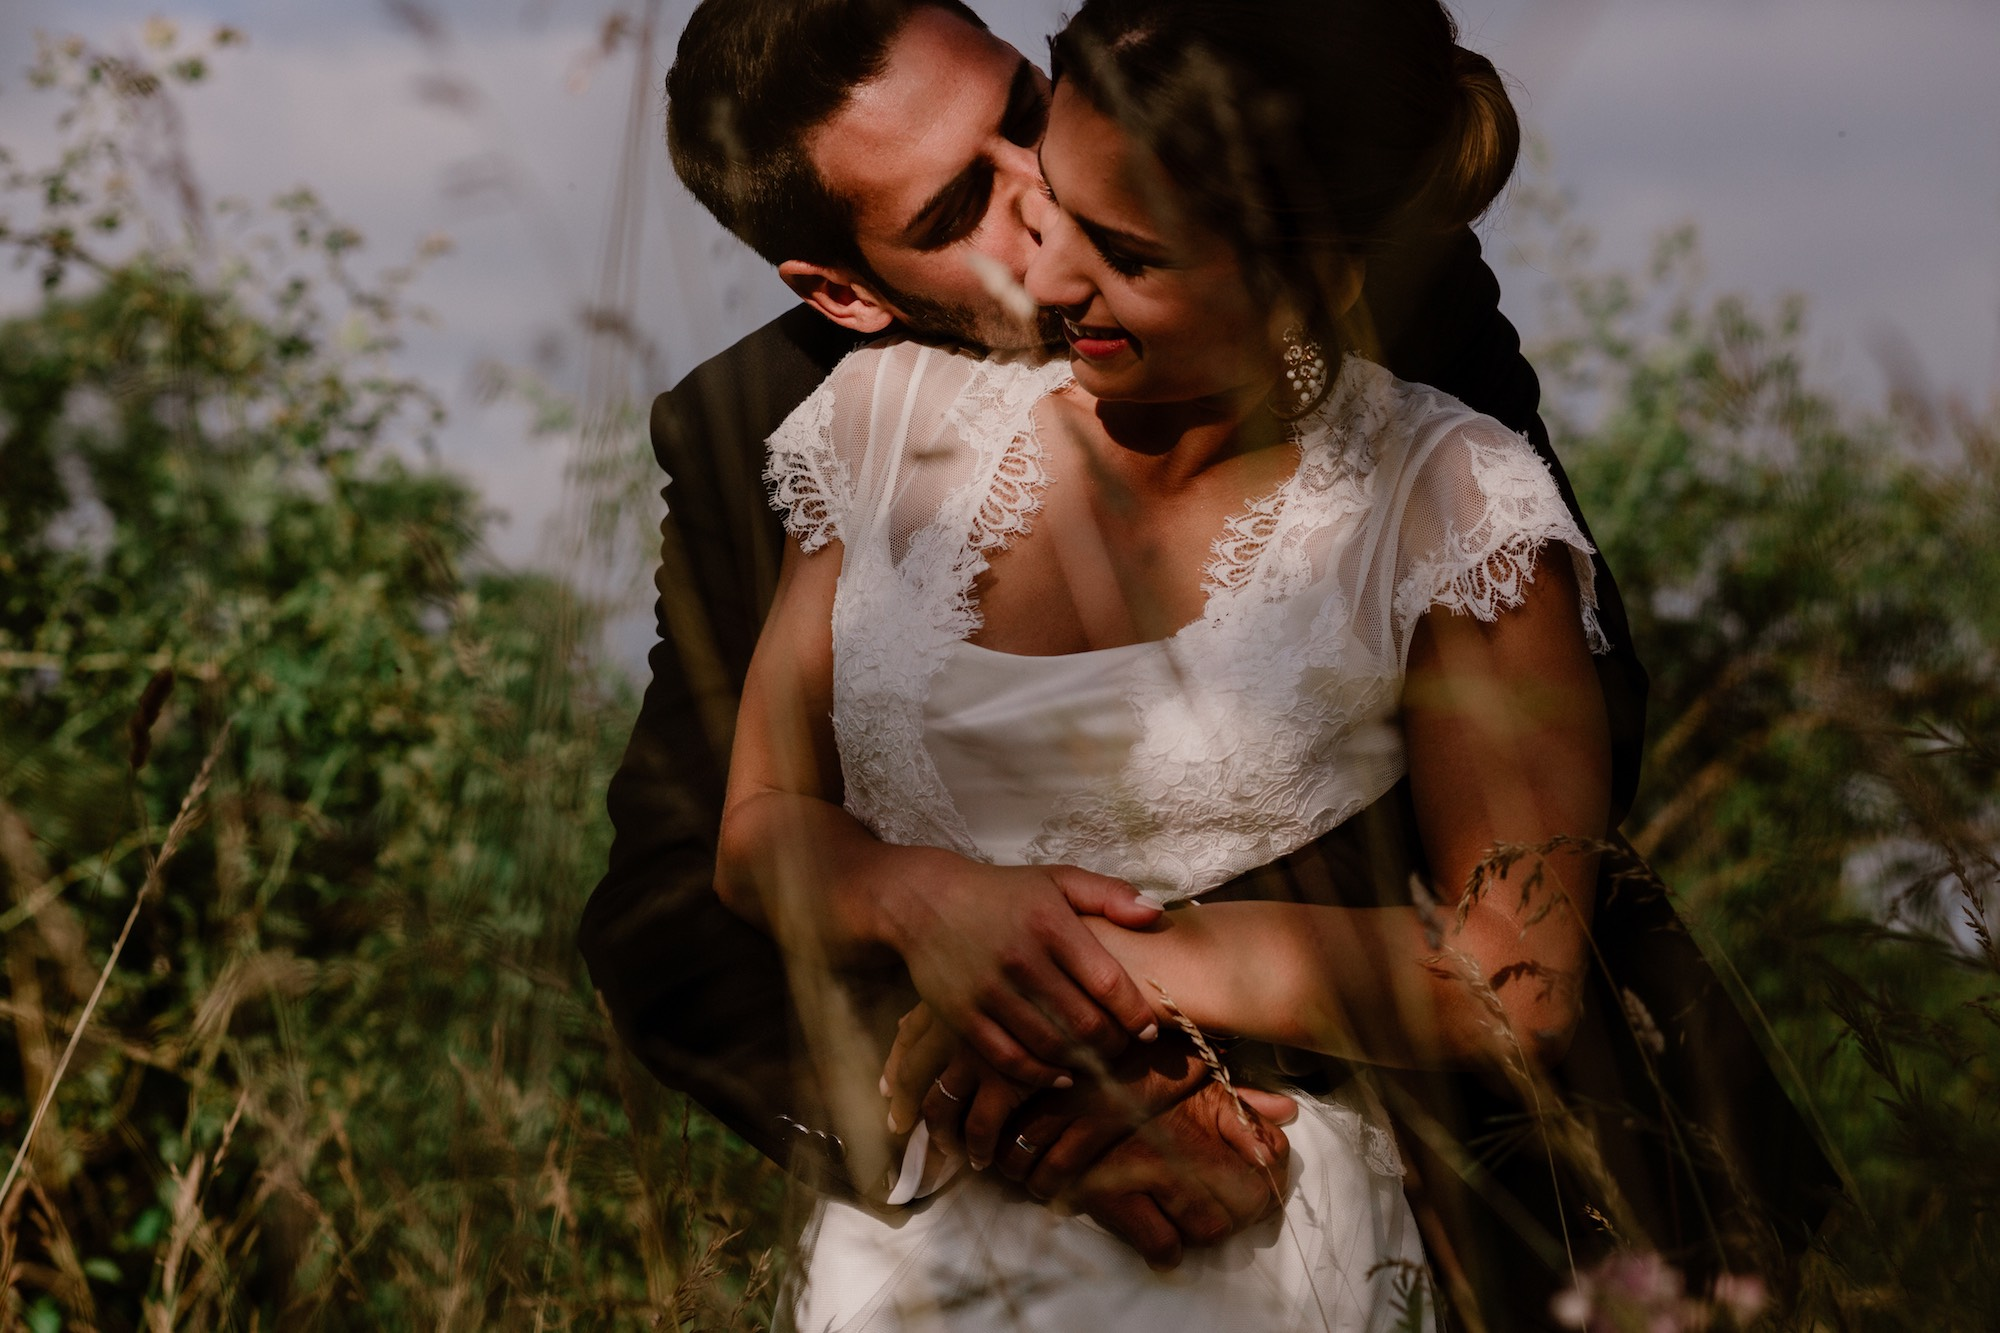 Mariage Lysianne Maxime 392 - Dagmara Bojenko - Eco-conscious Weddings, Births & Families